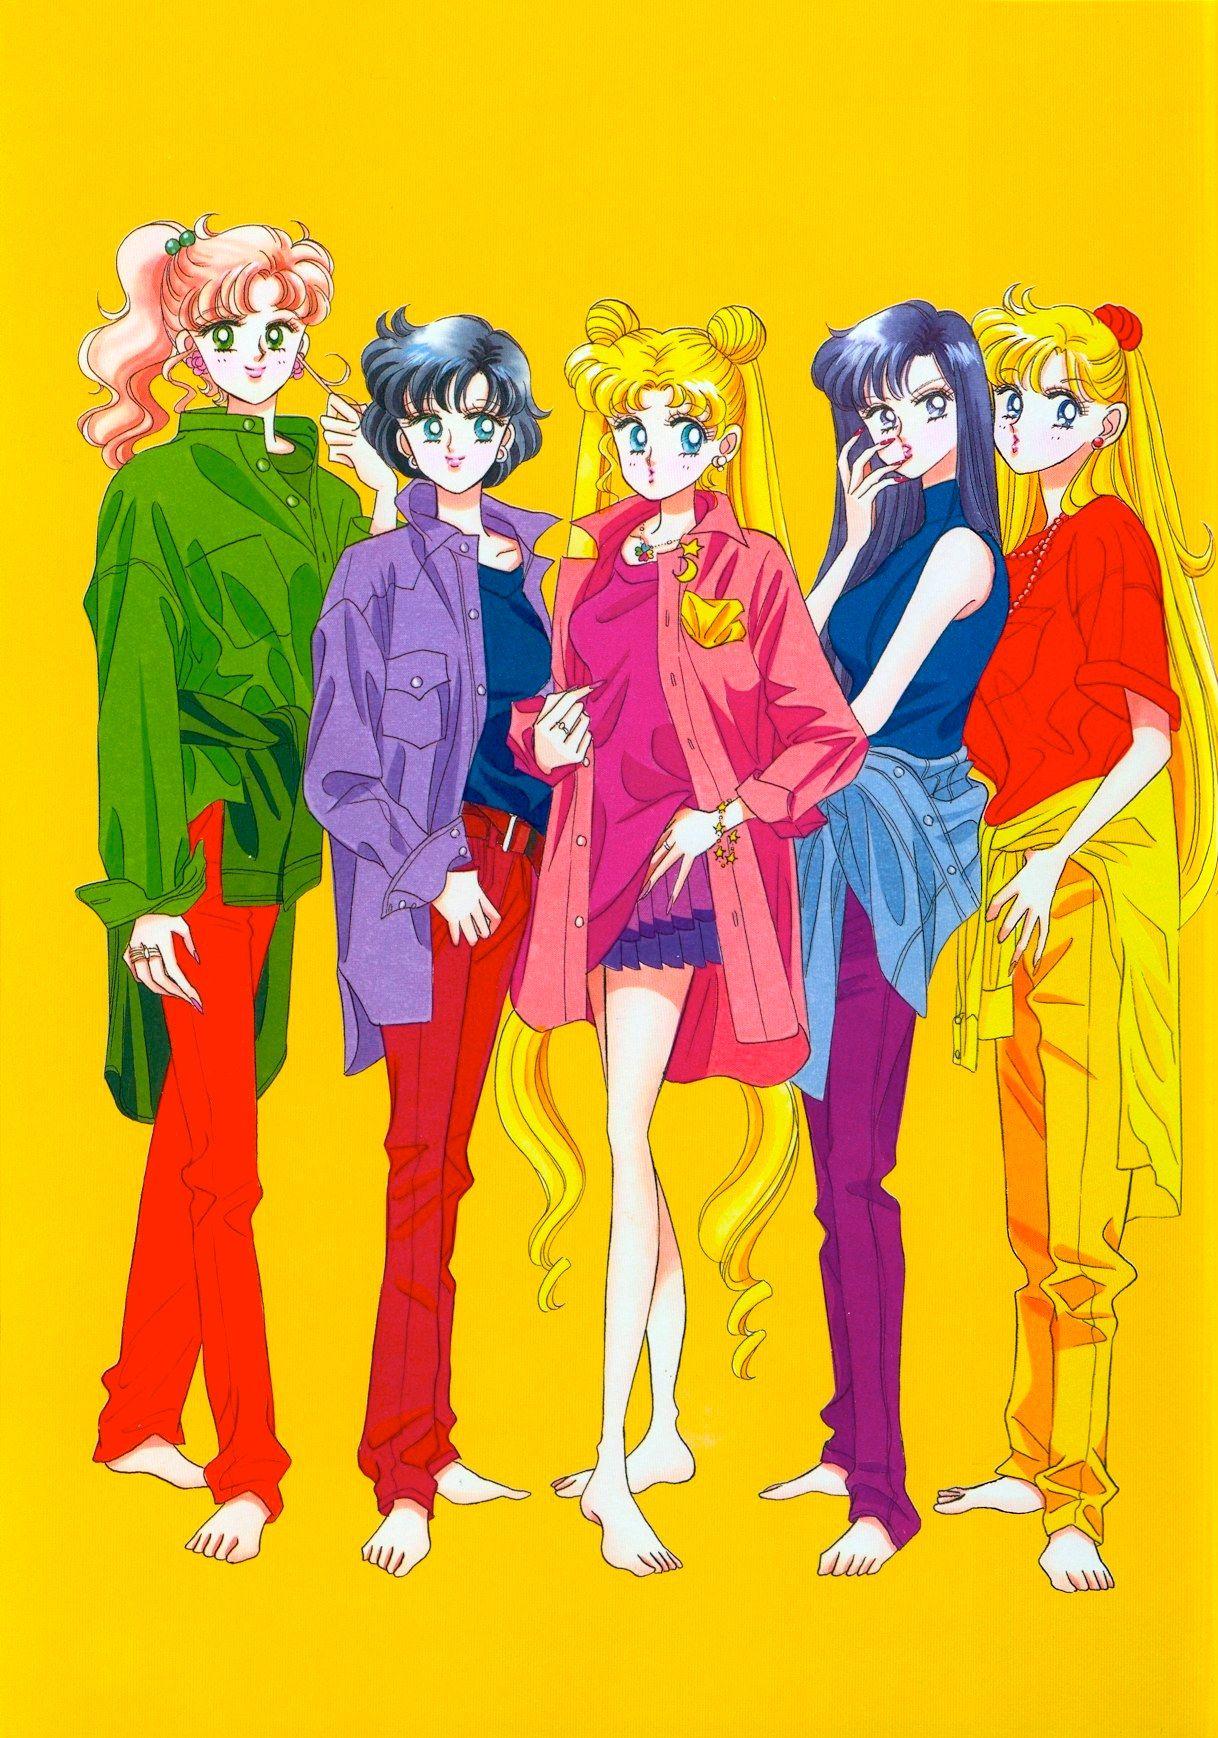 Makoto, Ami, Usagi, Rei, and Minako (Title Page from the